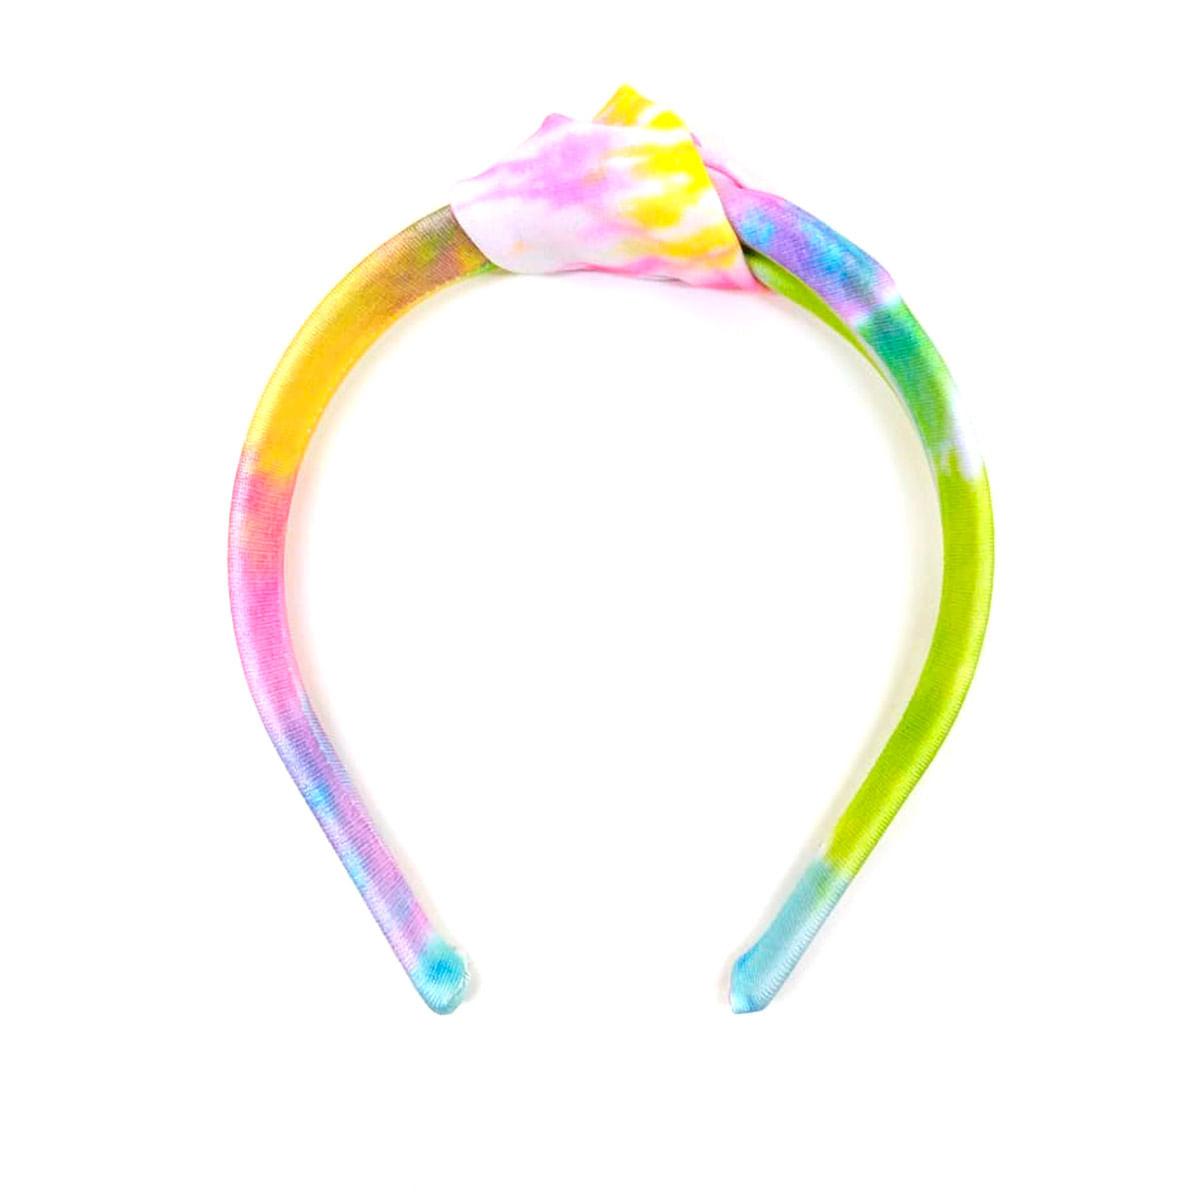 Tiara-Infantil-Lycra-Tie-Dye-Nozinho-Ludique-et-Badin-9035--VER21-